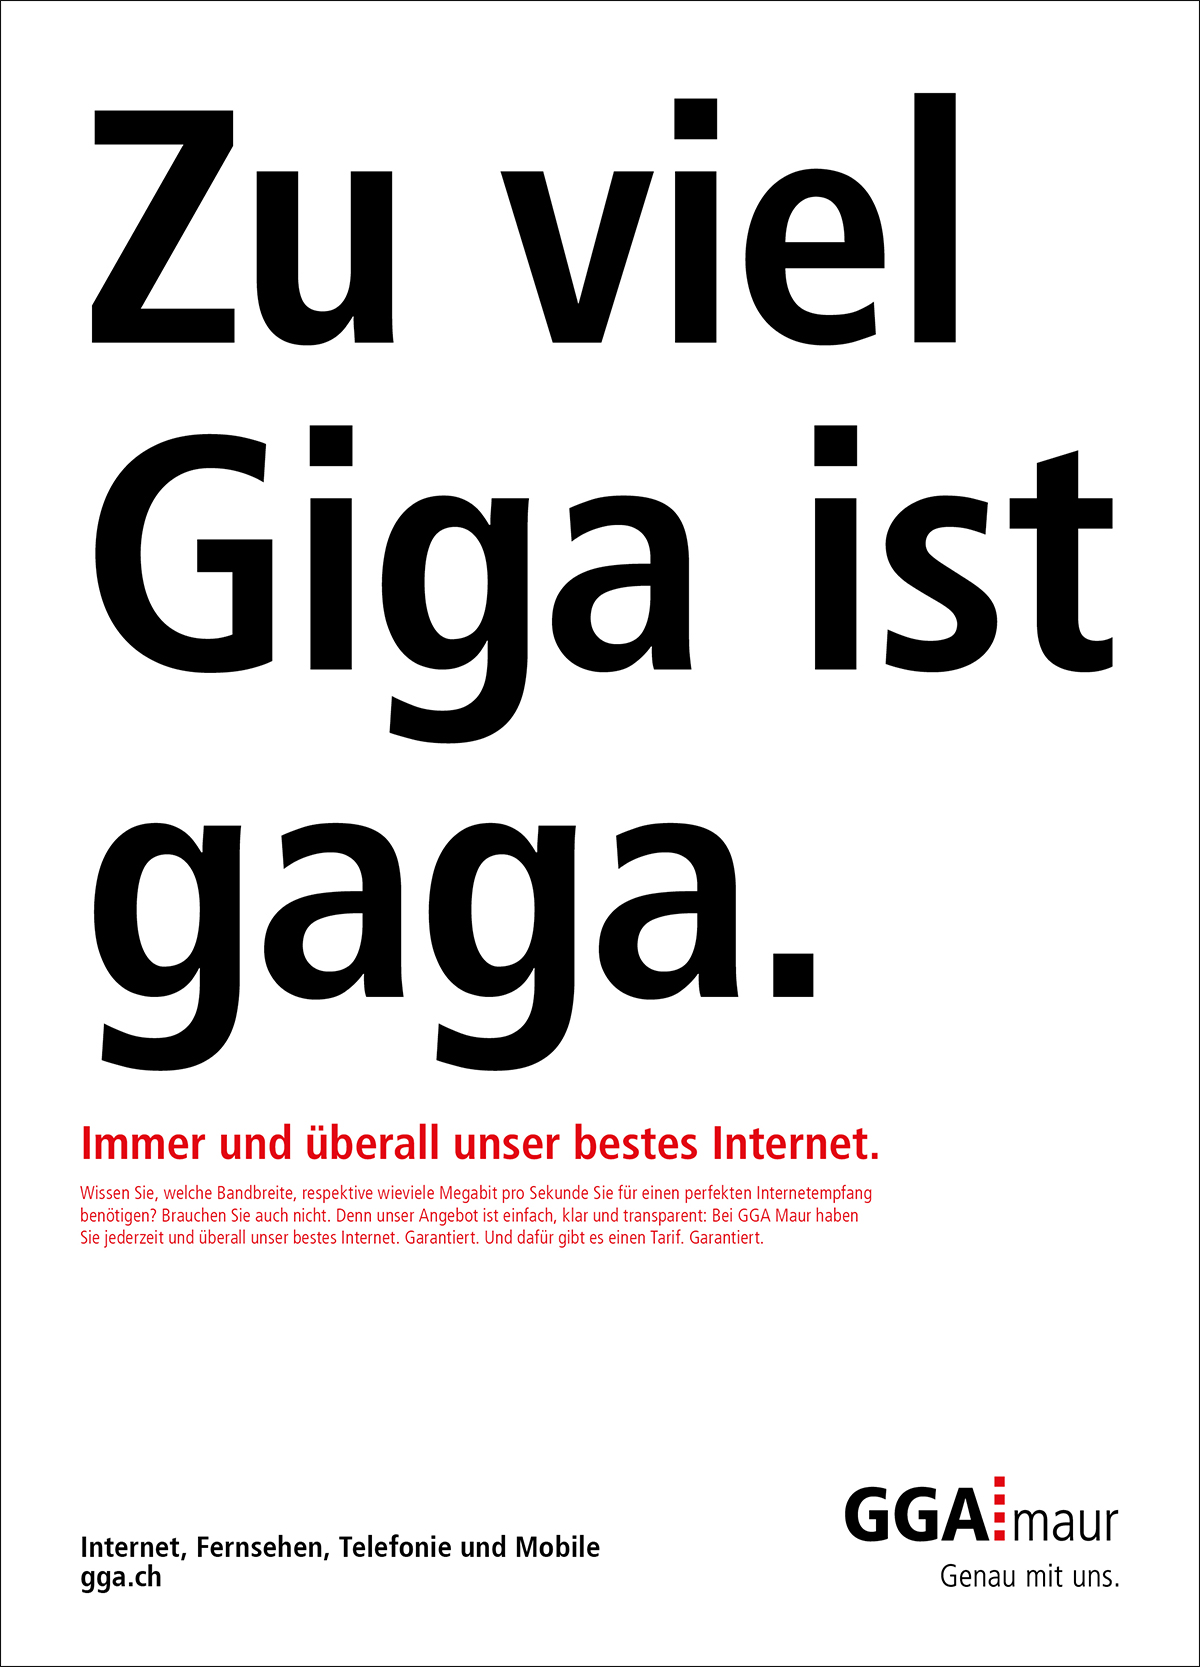 GGA_Maur_Anzeige